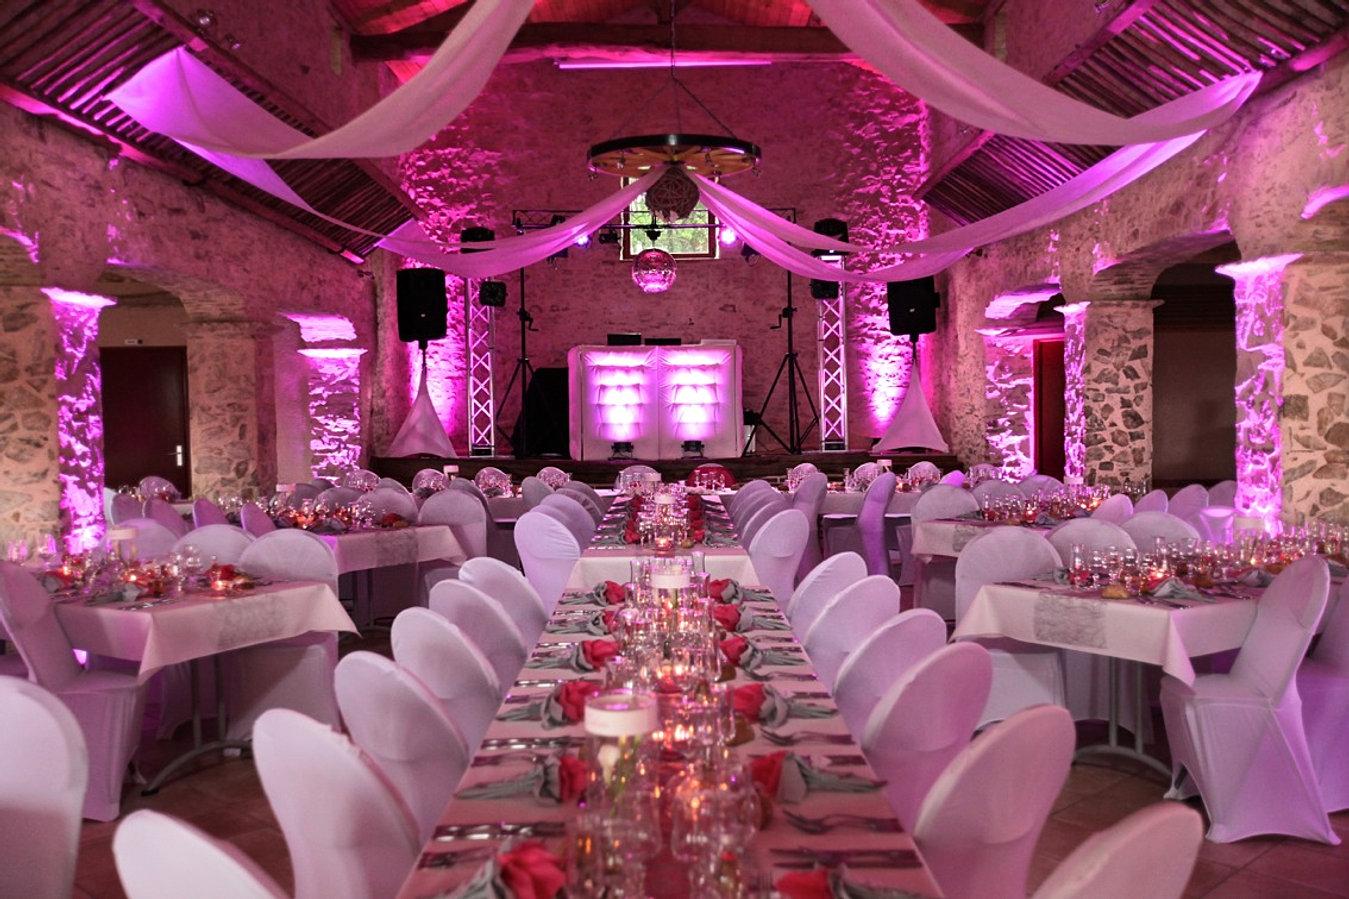 west ambiance dj photo organisation mariage et vnements nantes - Salle Mariage Vallet